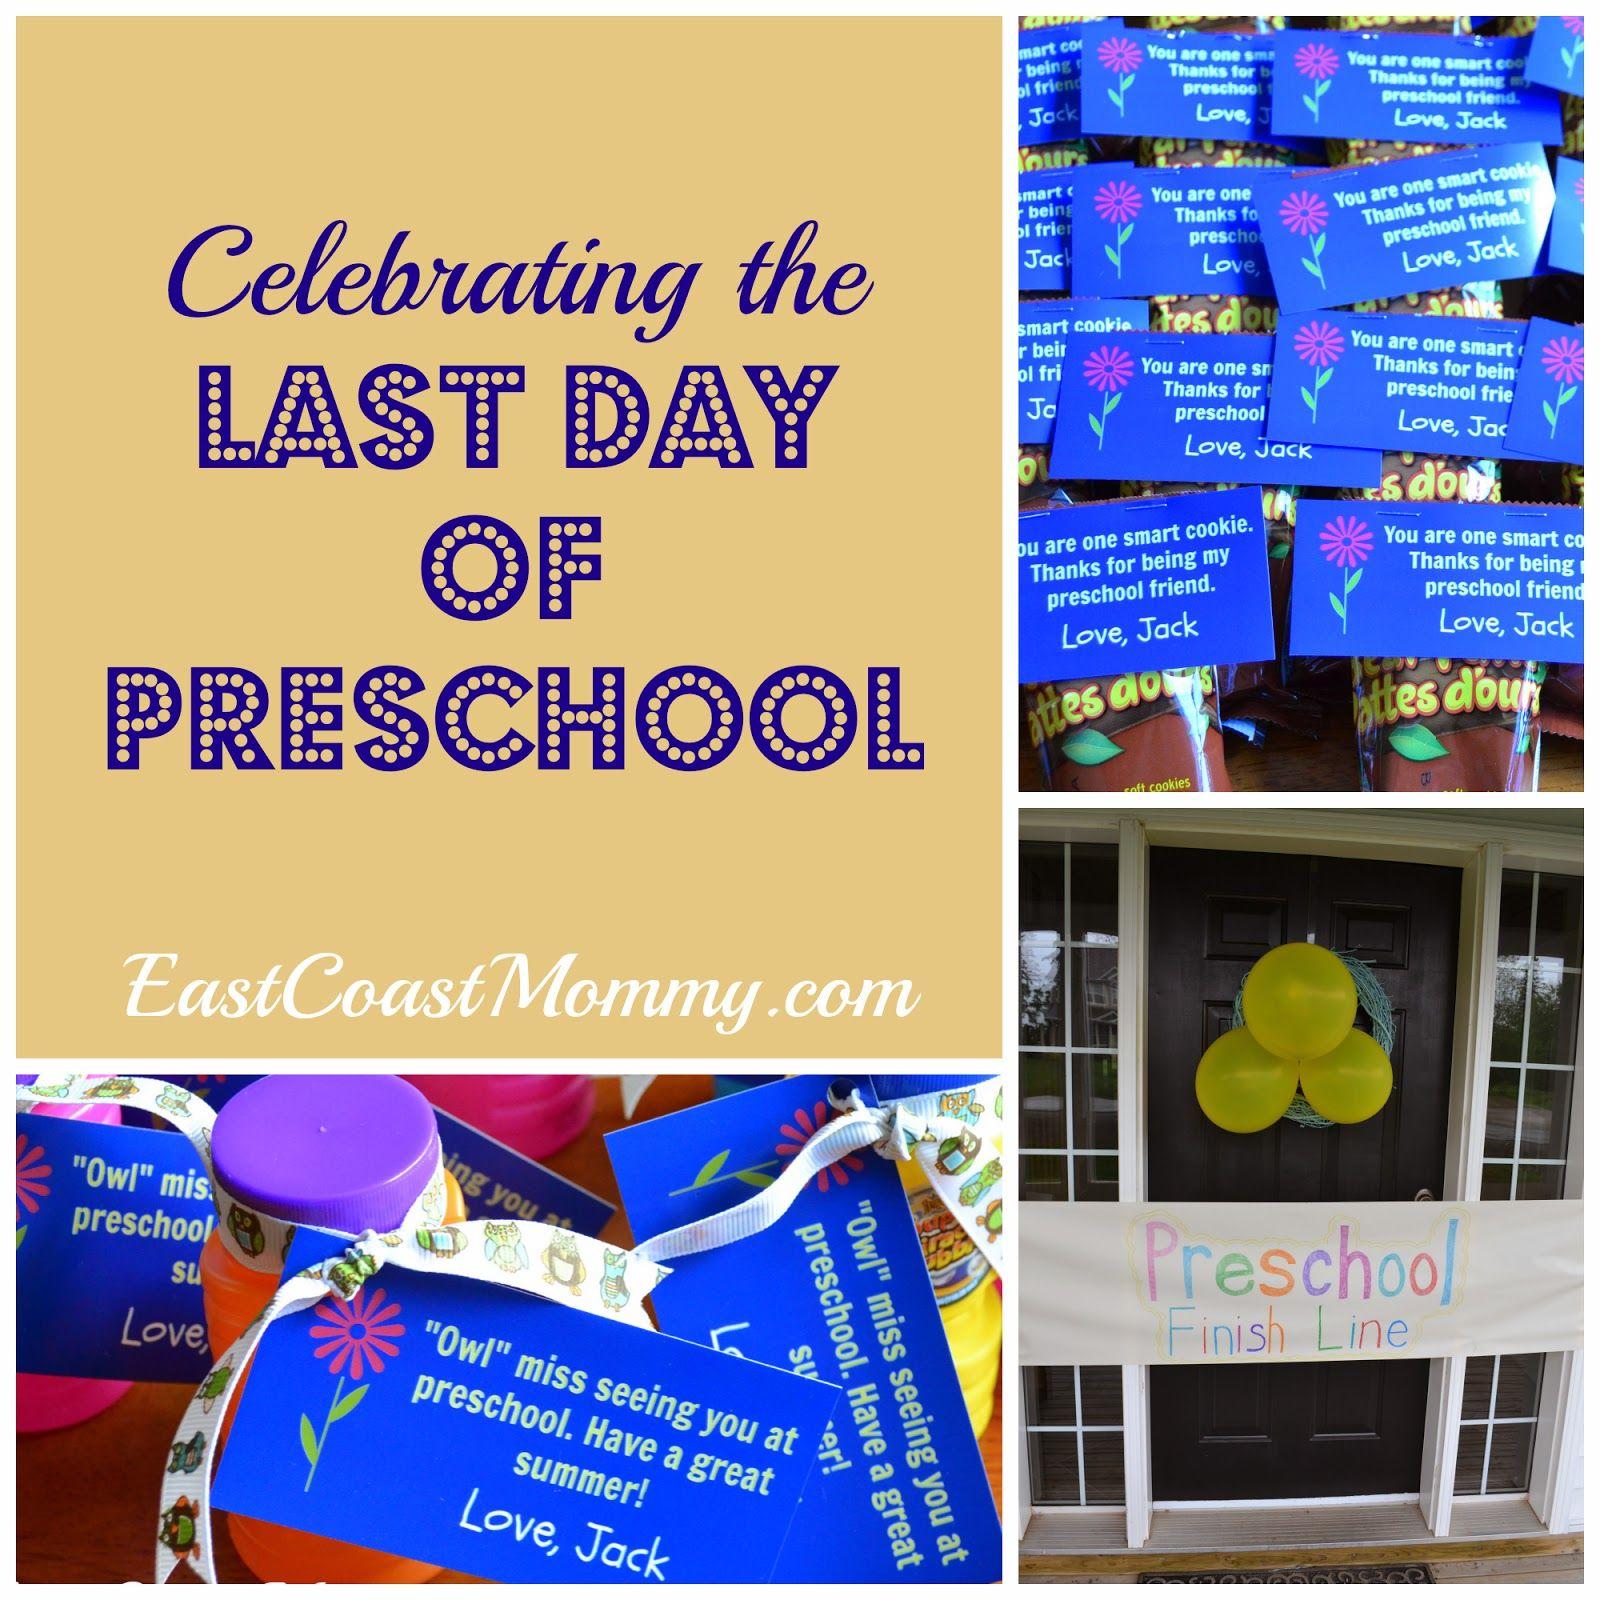 Celebrating the last day of preschool preschool teacher